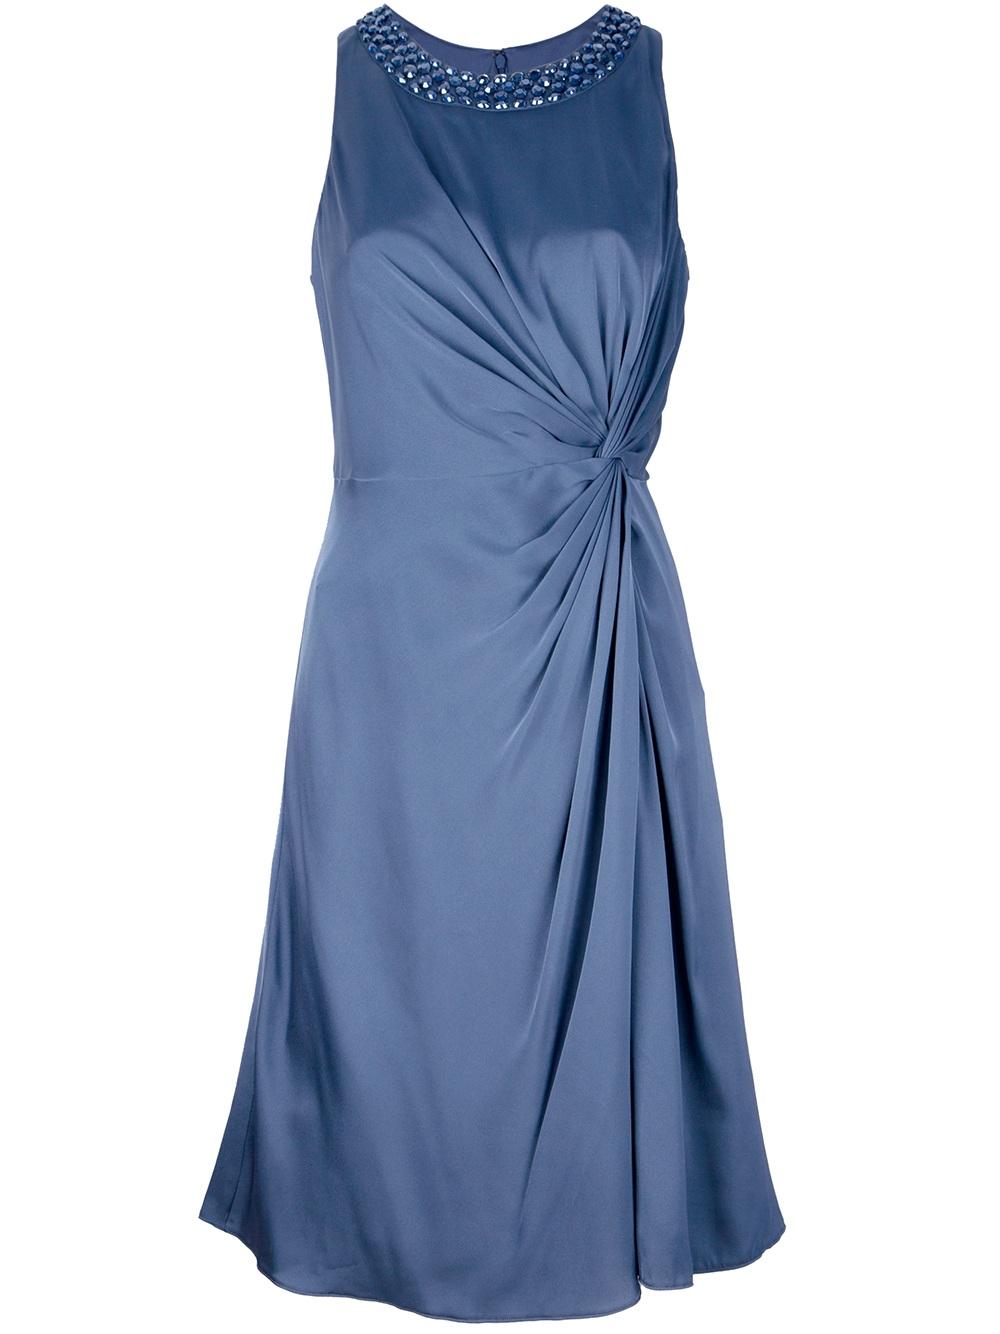 Armani-Collezioni-embellished-collar-dress-9-1.jpg